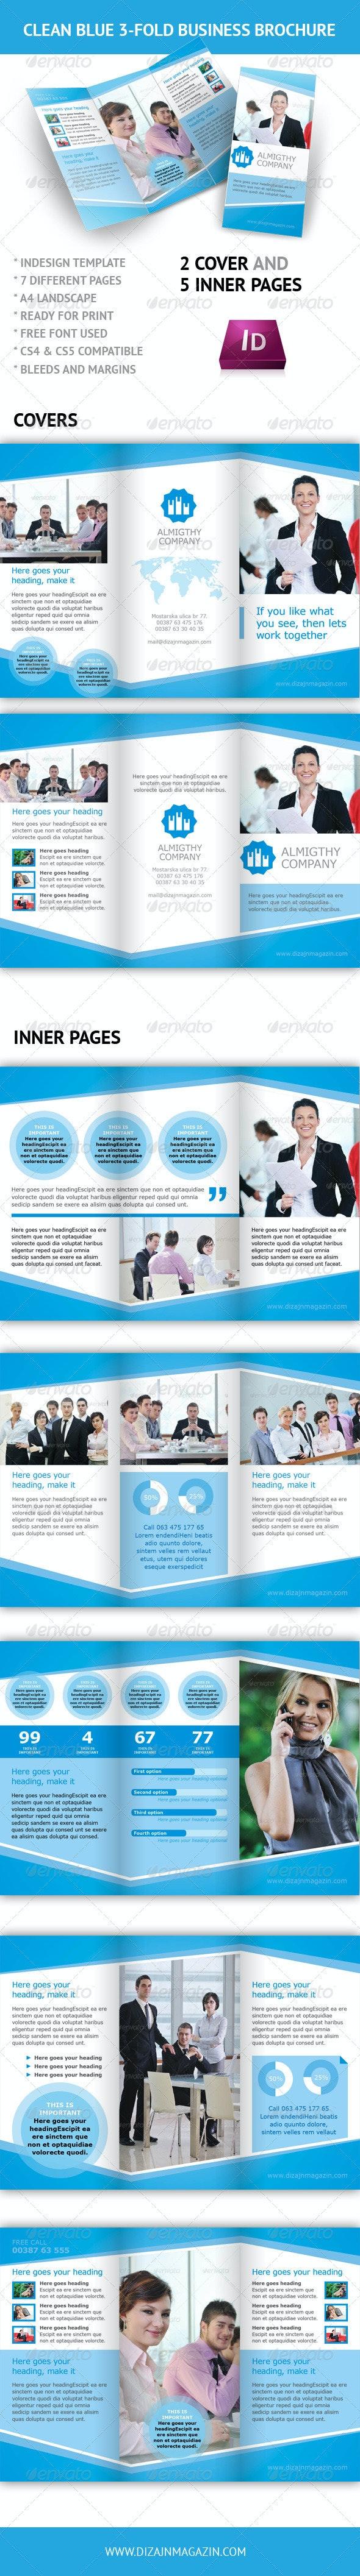 Clean Blue 3-fold Business Brochure - InDesign - Corporate Brochures